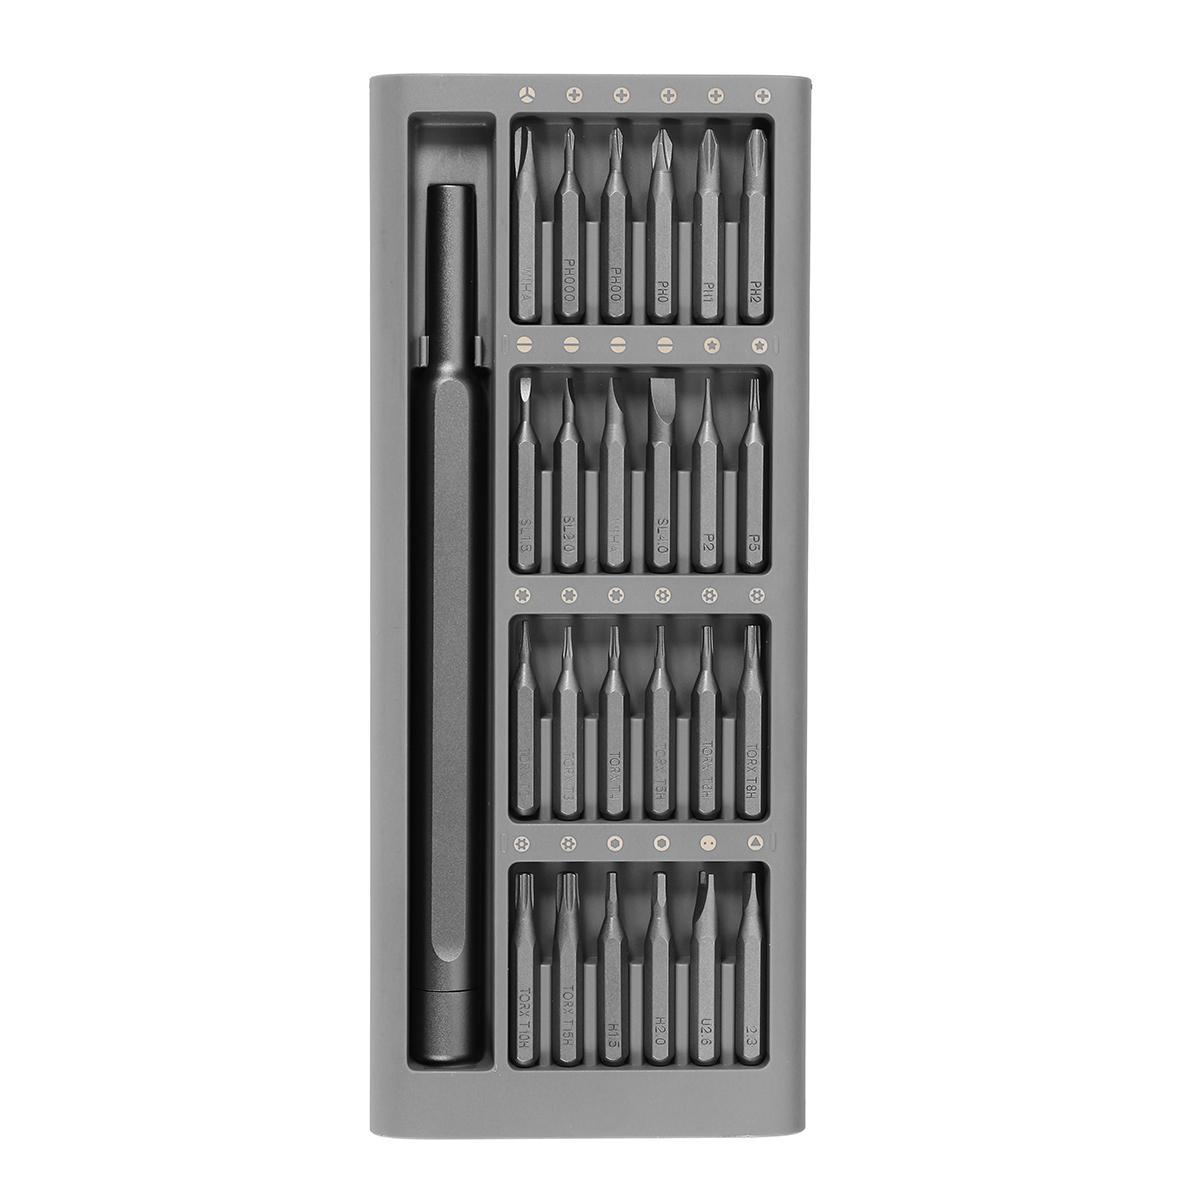 Xiaomi Wiha 25 in 1 Mehrzweck Präzision-Schraubendreher-Set